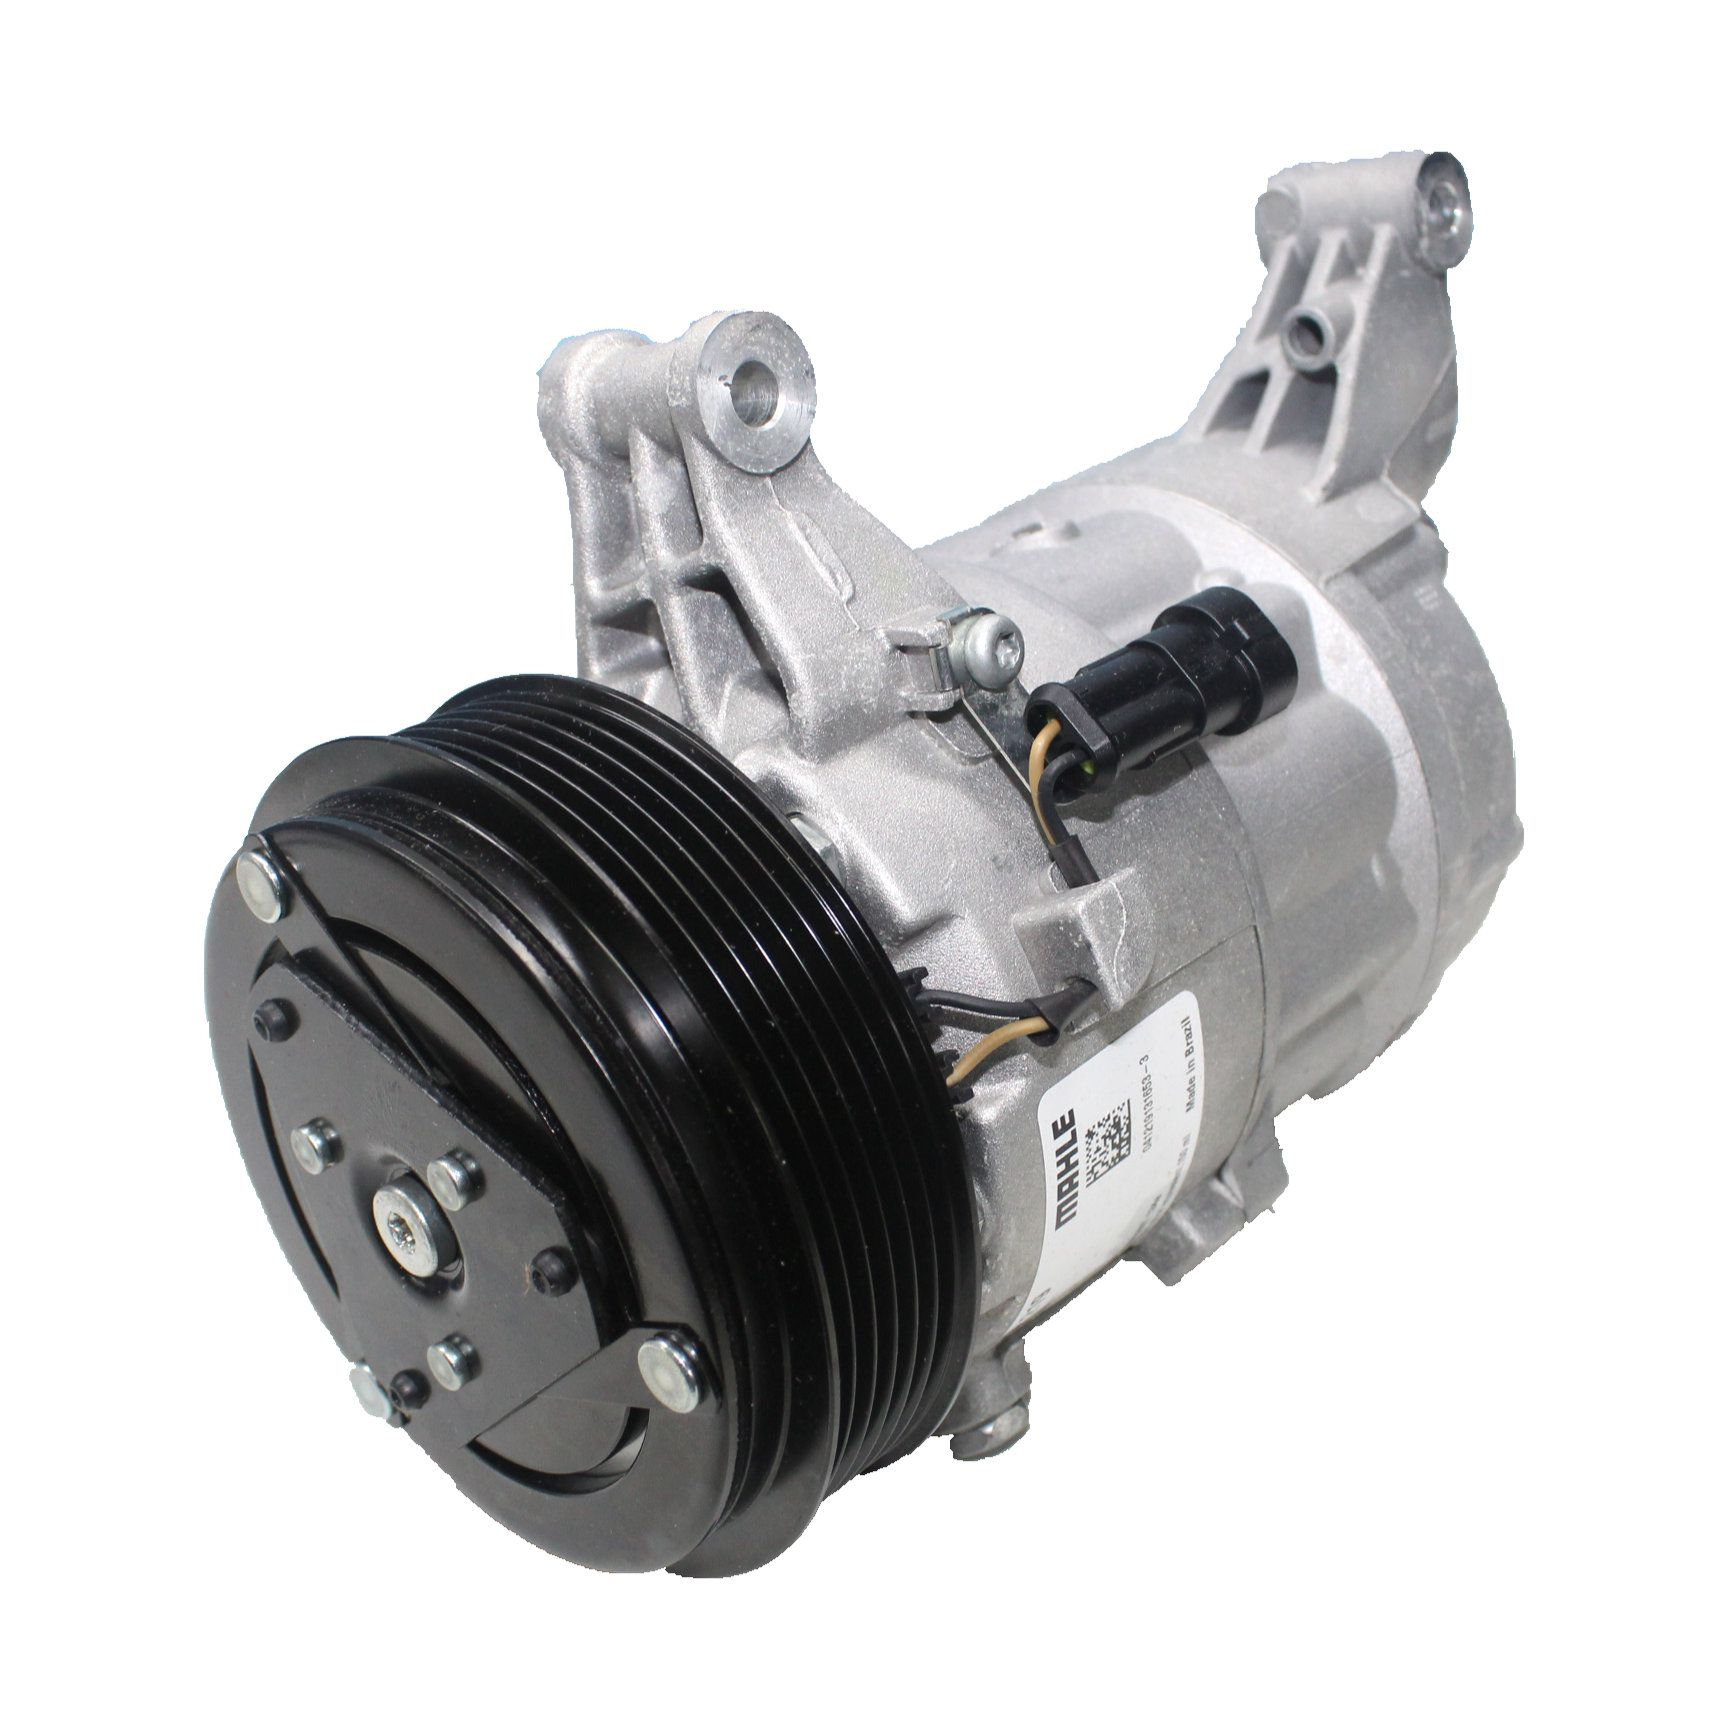 Compressor Ar Condicionado Mahle Palio, Strada, Siena, idea, Doblo - Etorq 115mm